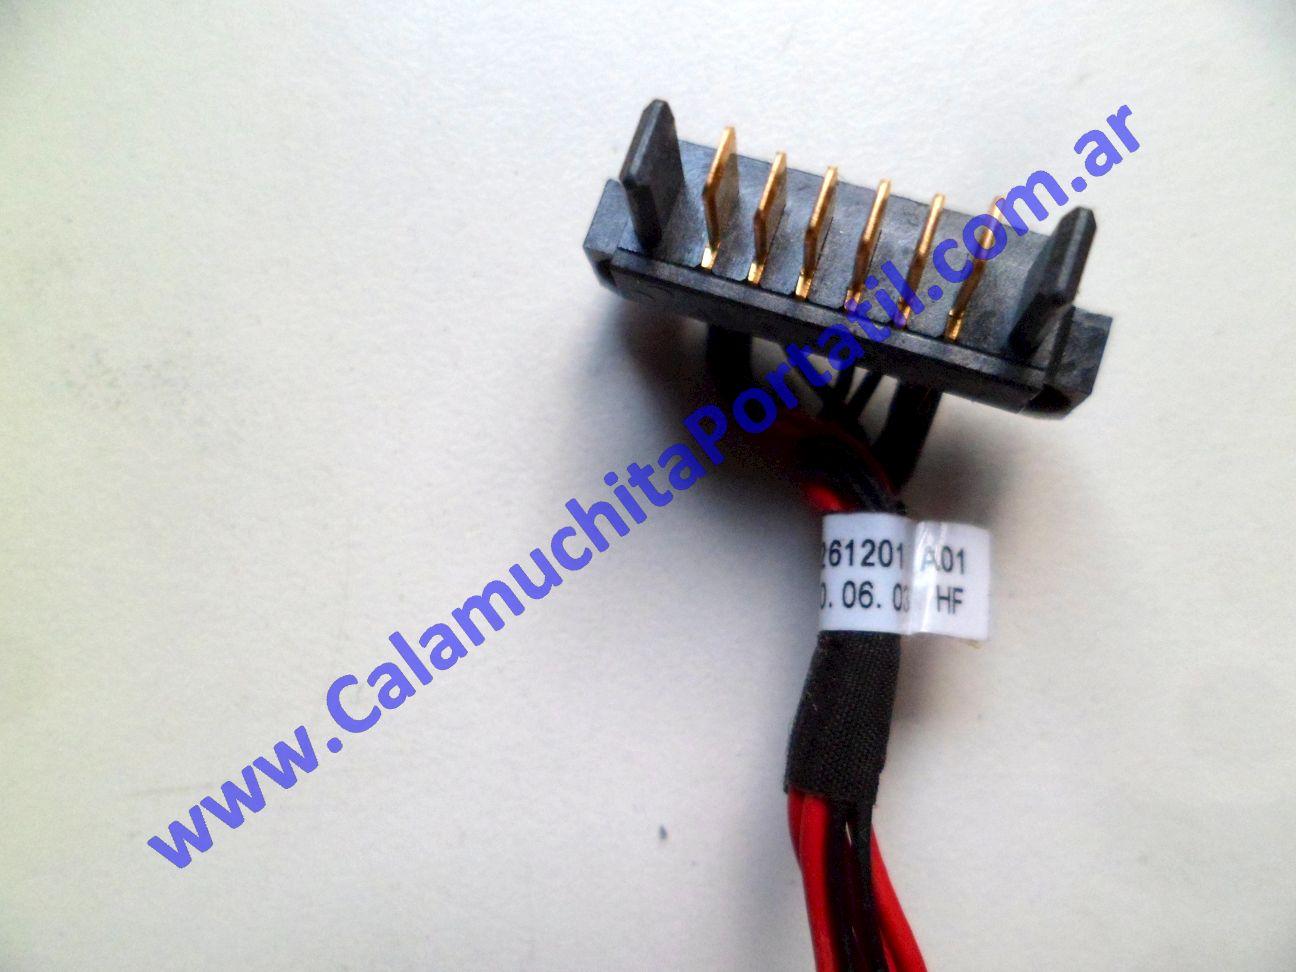 0447JVA Conector Varios Hewlett Packard HP 425 / XL406LT#AC8